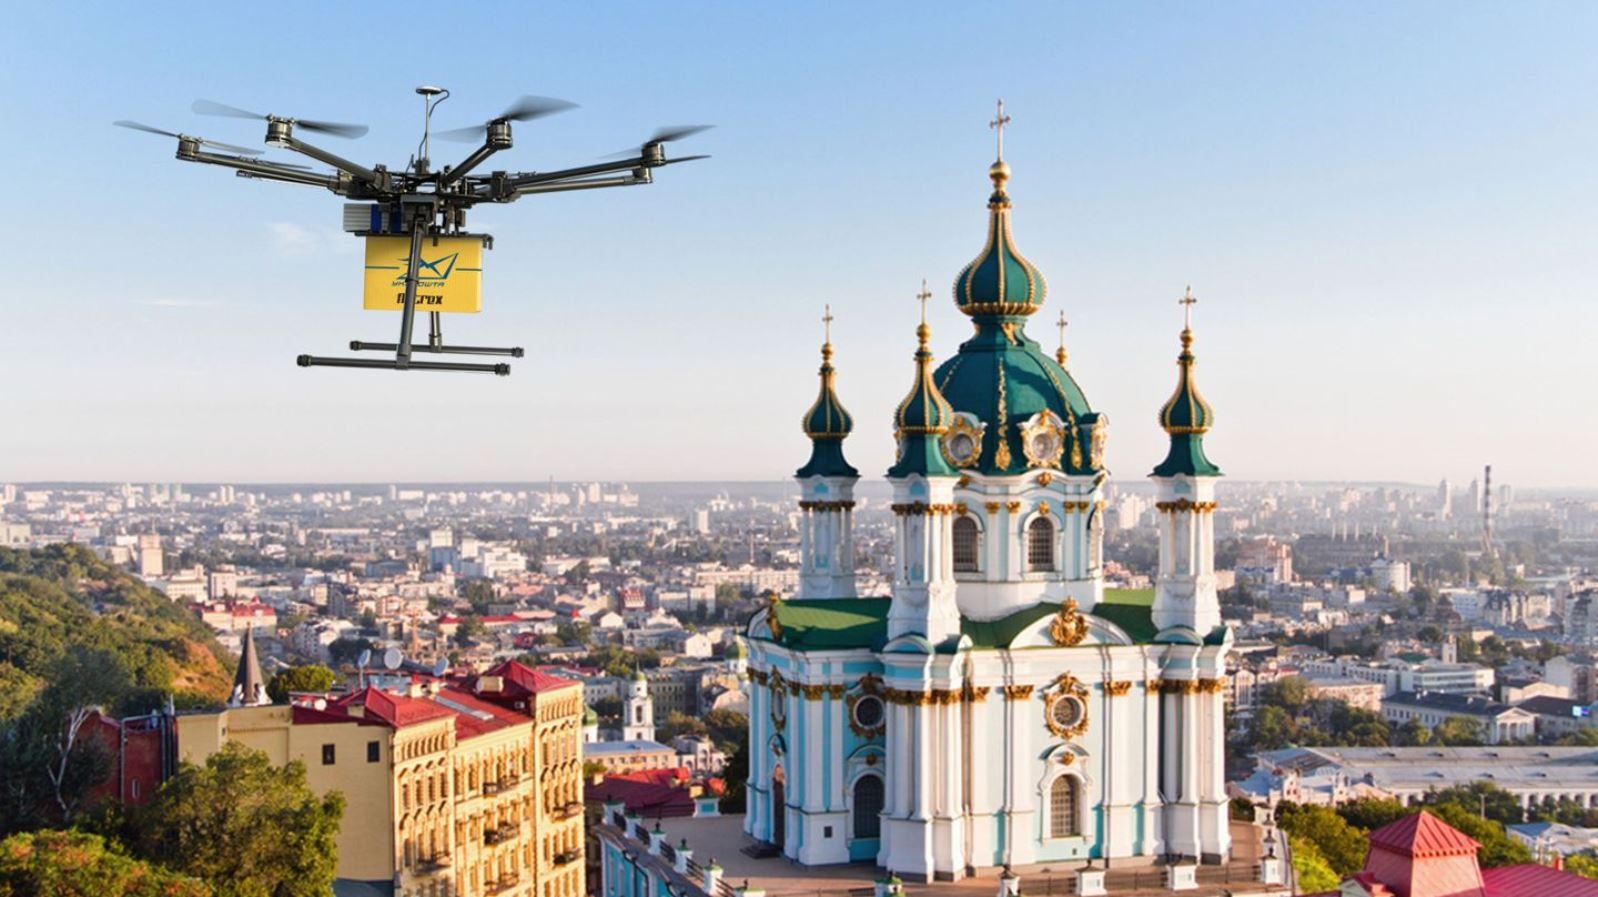 Flytrex Mule personal delivery drone flying in Ukraine. Photo via Start-Up Nation Finder